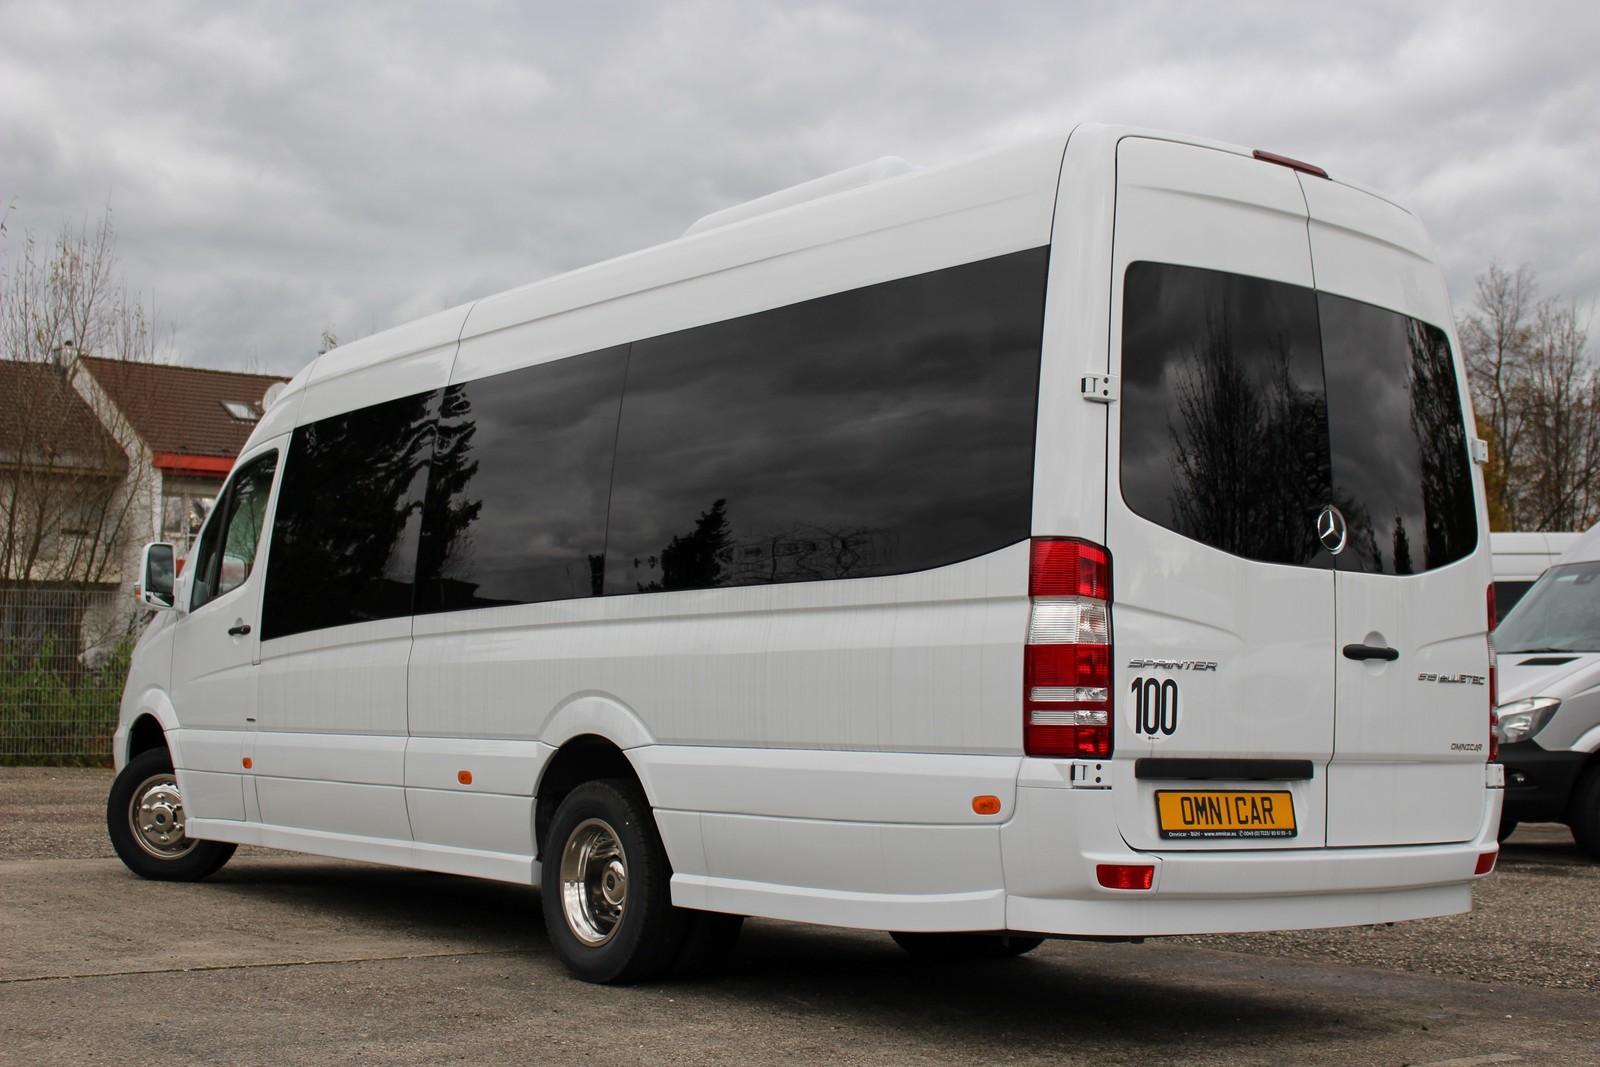 neuer kleinbus mercedes sprinter tourismus 21 pl tzeomnicar gmbh. Black Bedroom Furniture Sets. Home Design Ideas